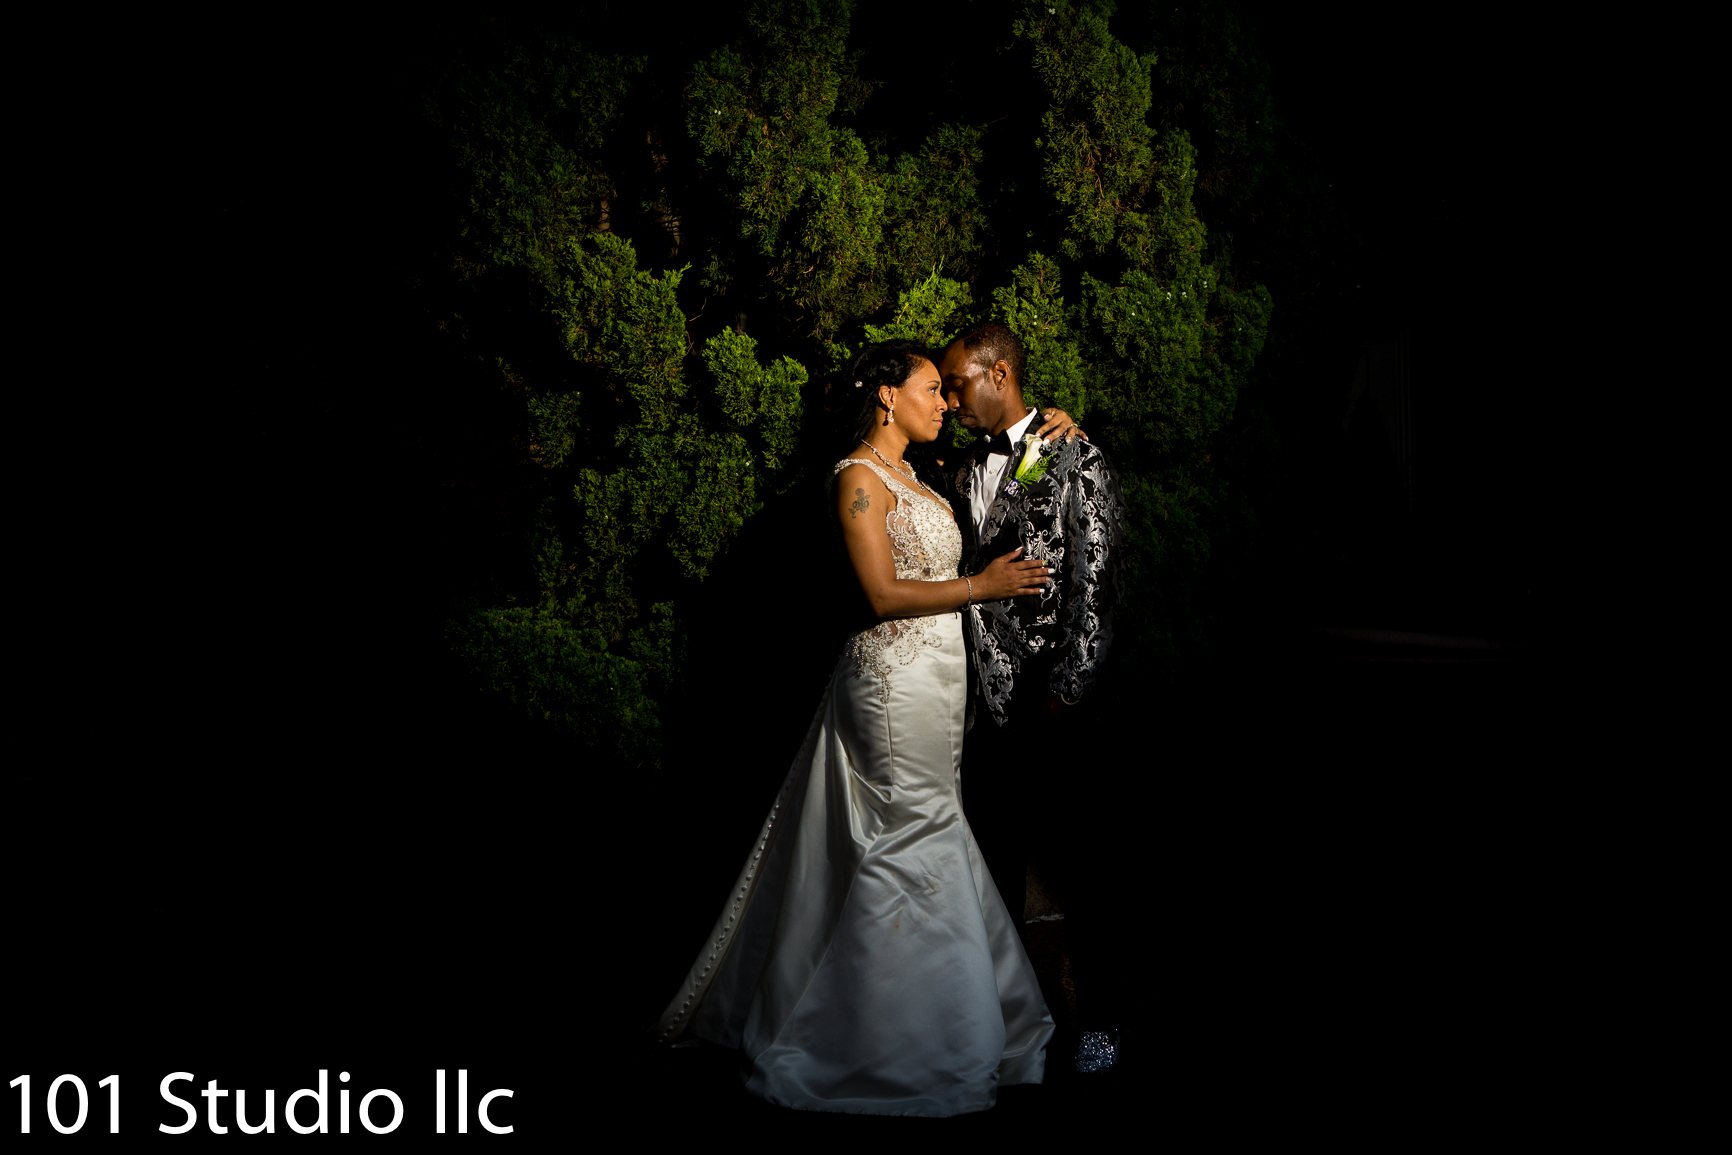 Raleigh  wedding photographer - 101 Studio llc -19.jpg